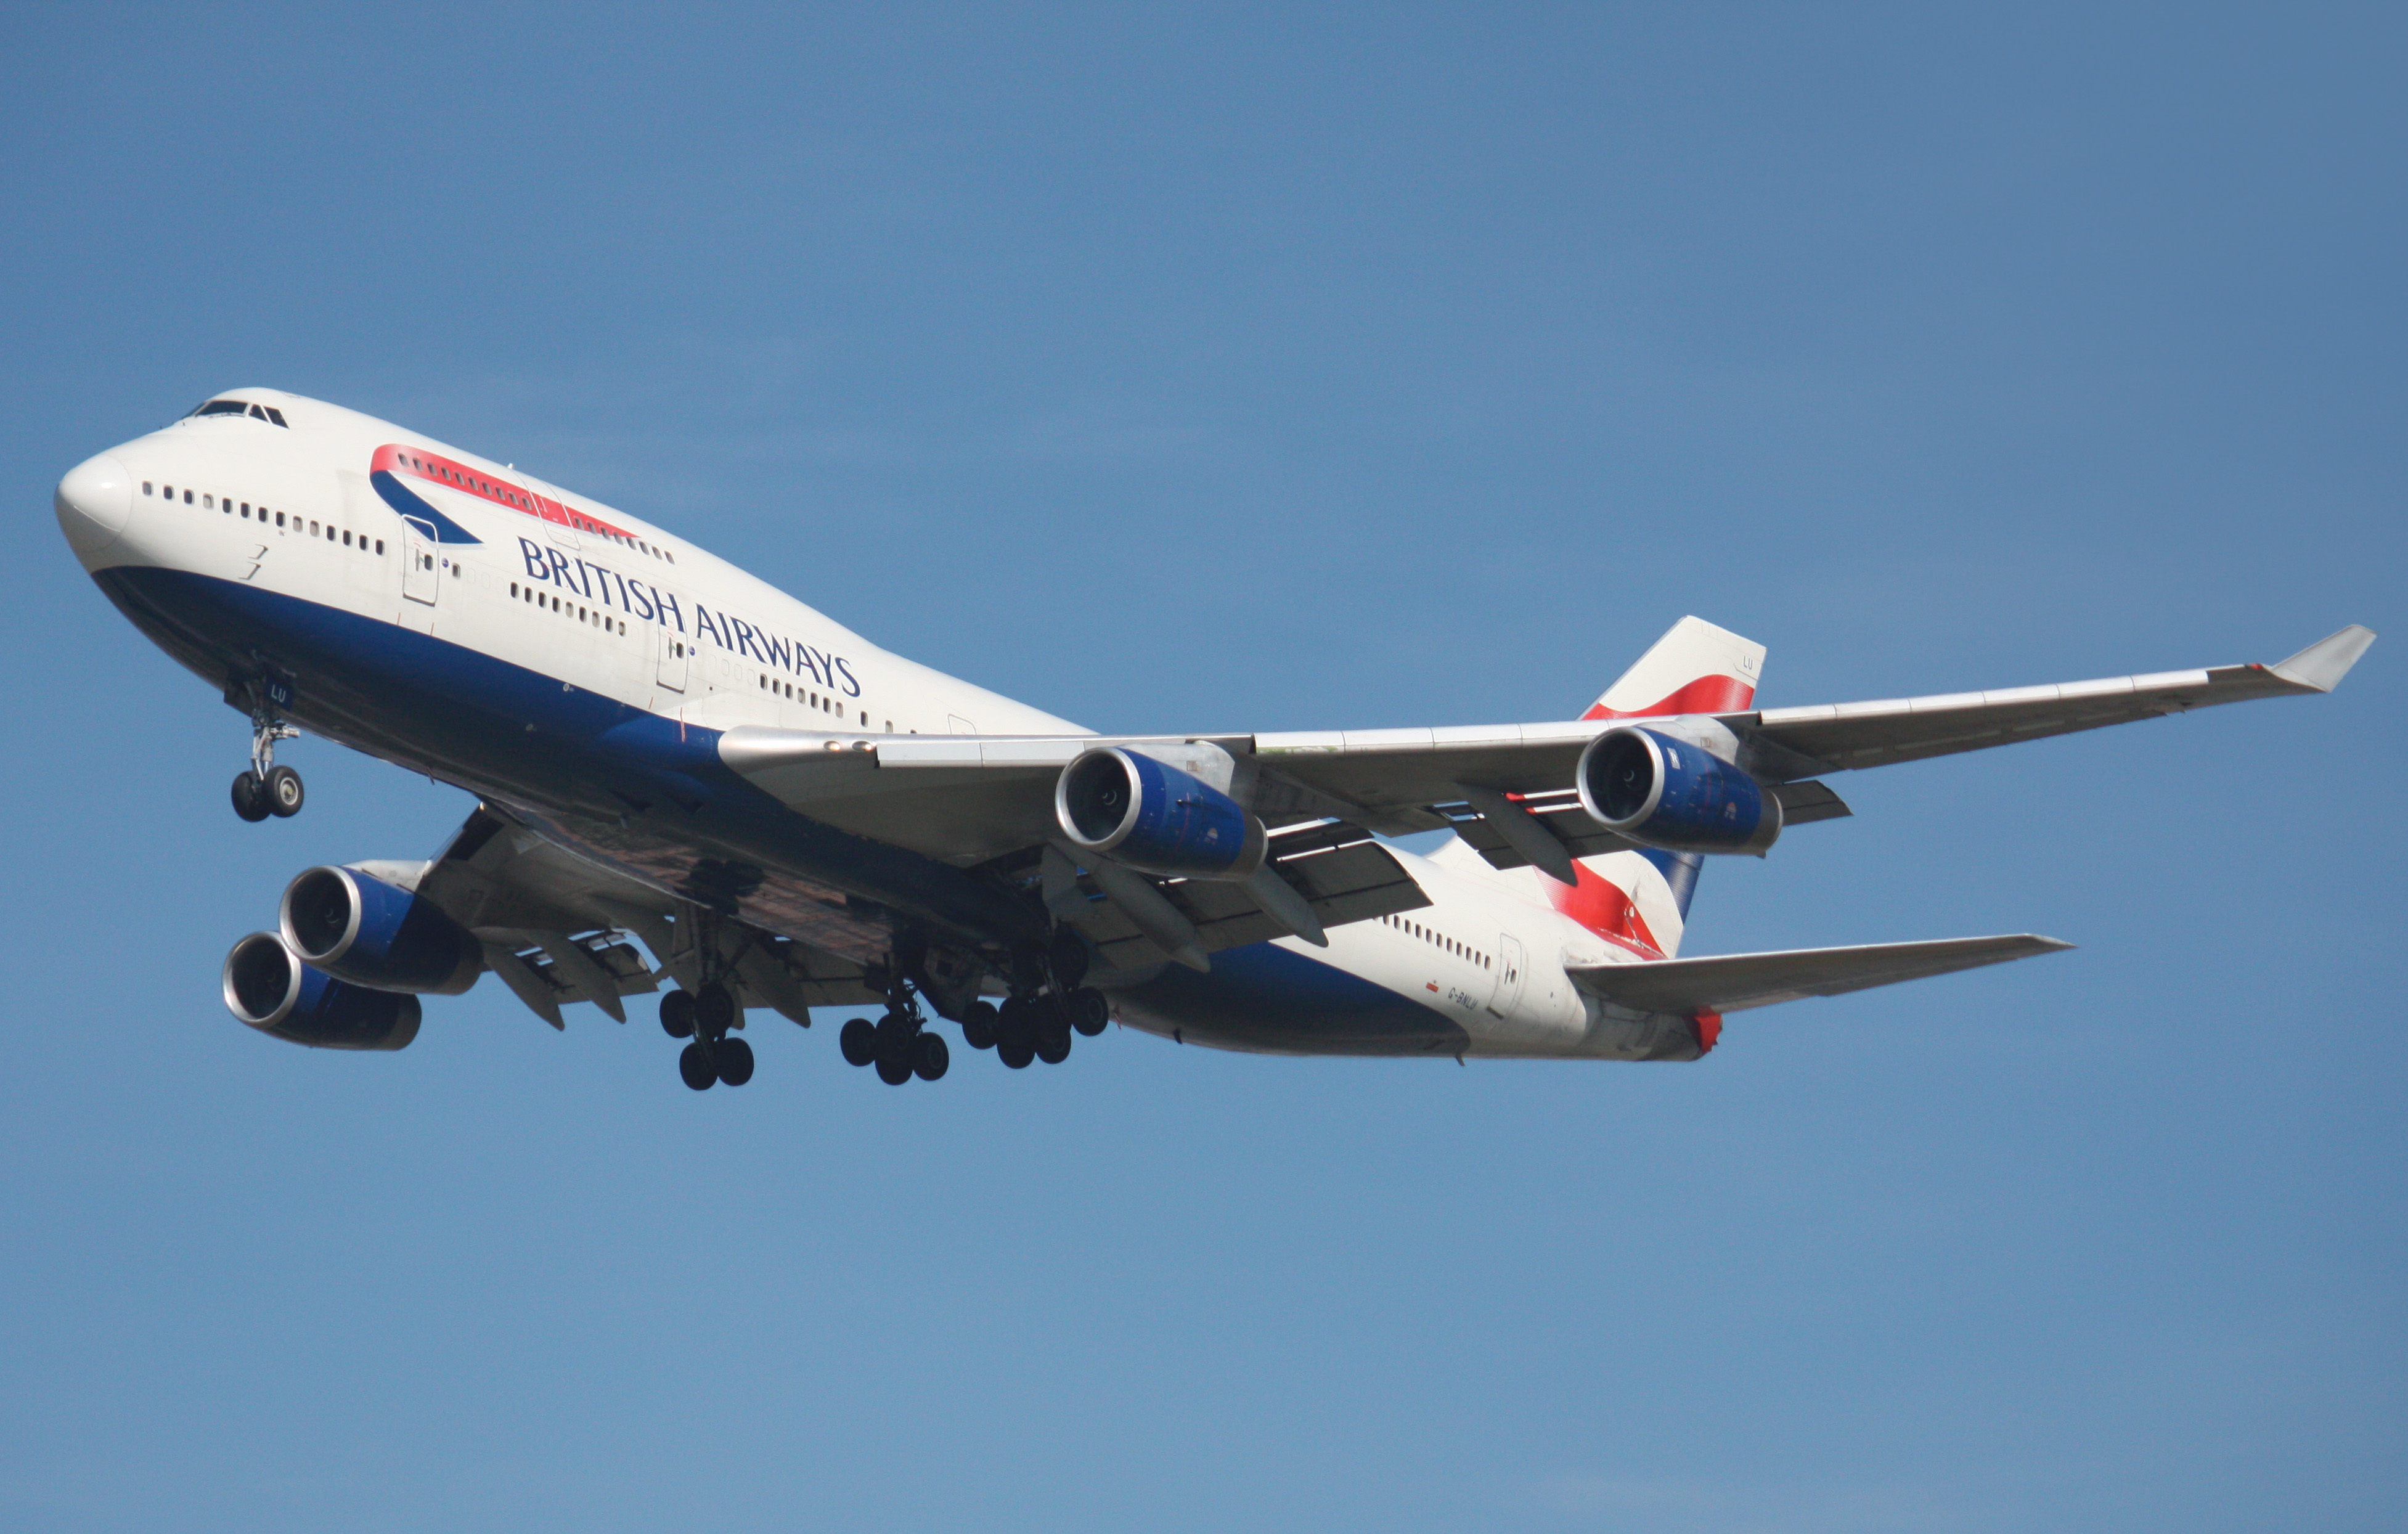 En Boeing 747-400 fra British Airways. Foto: Makaristos